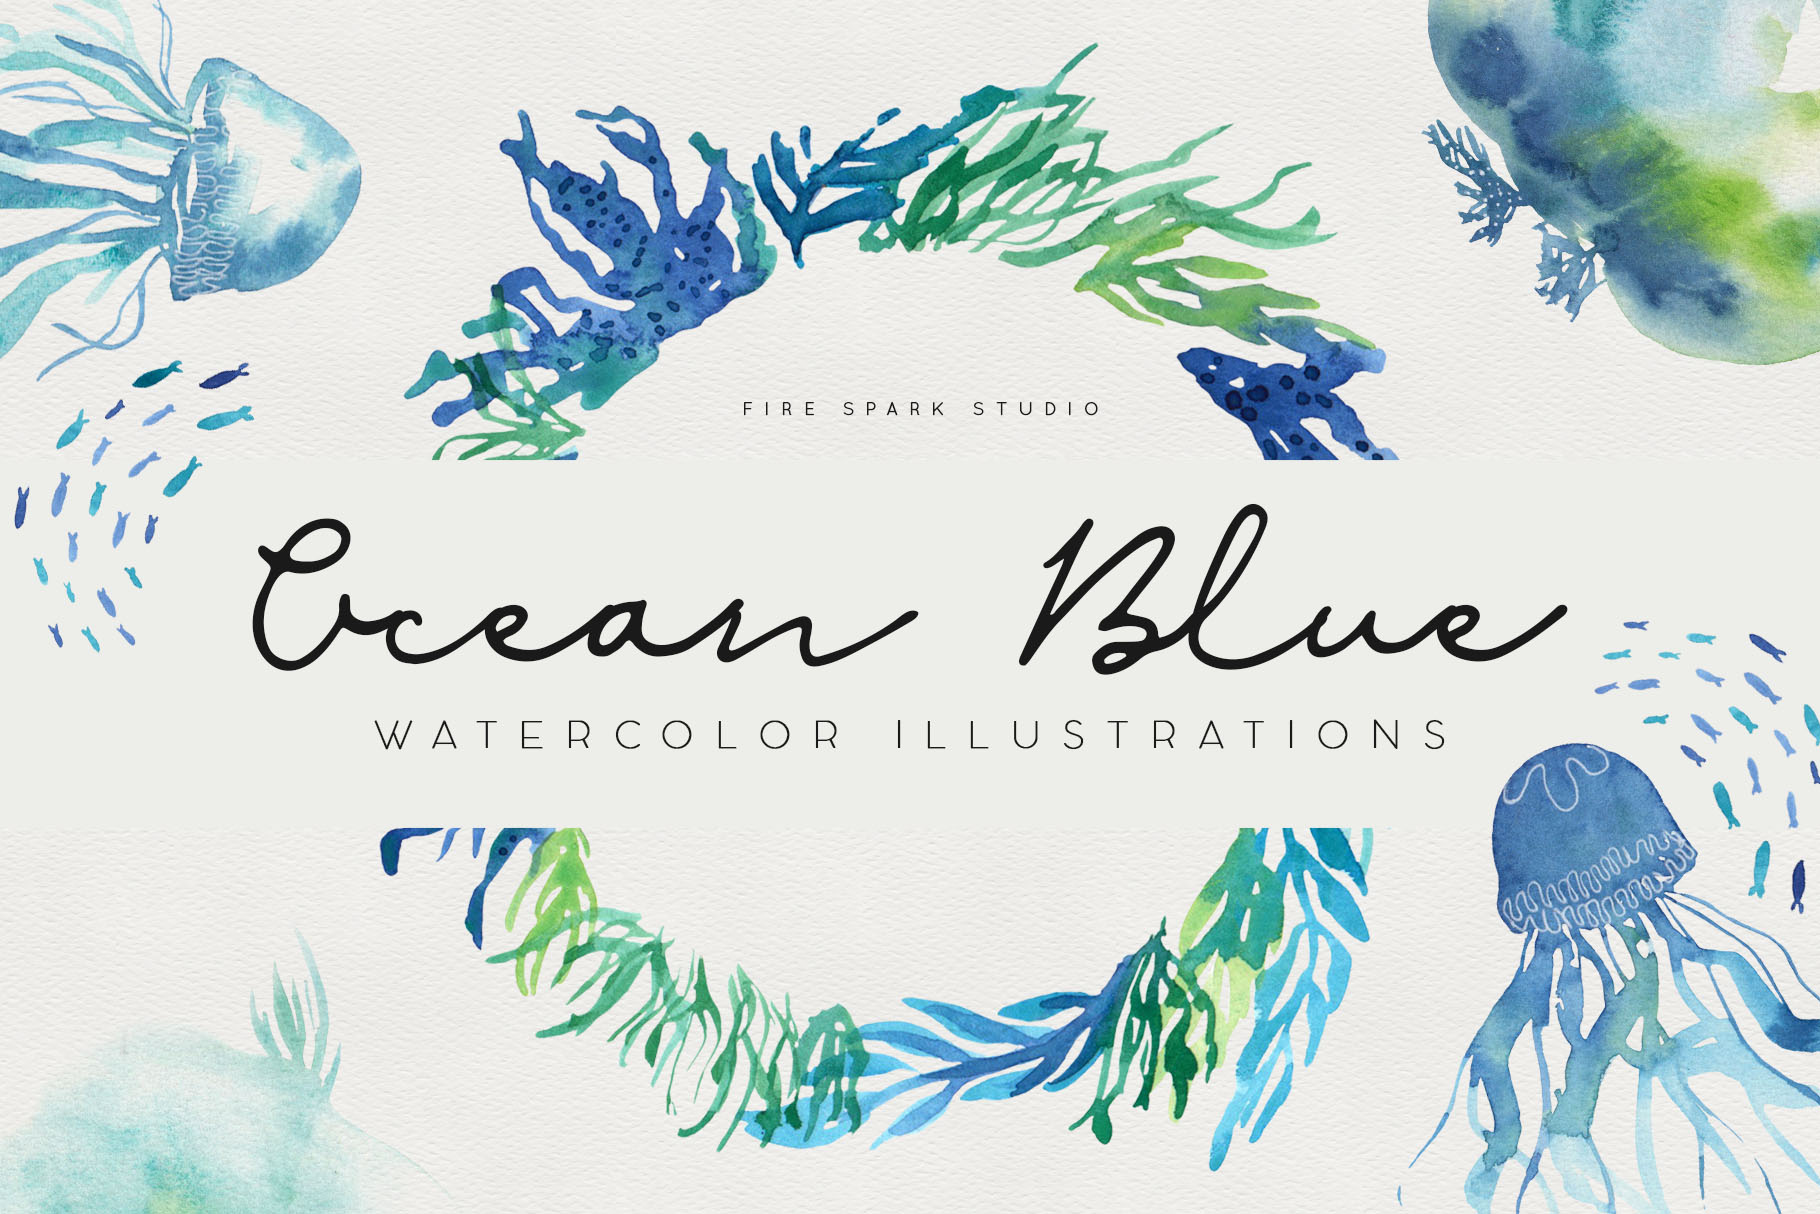 Ocean Blue Watercolor Illustrations - $12+